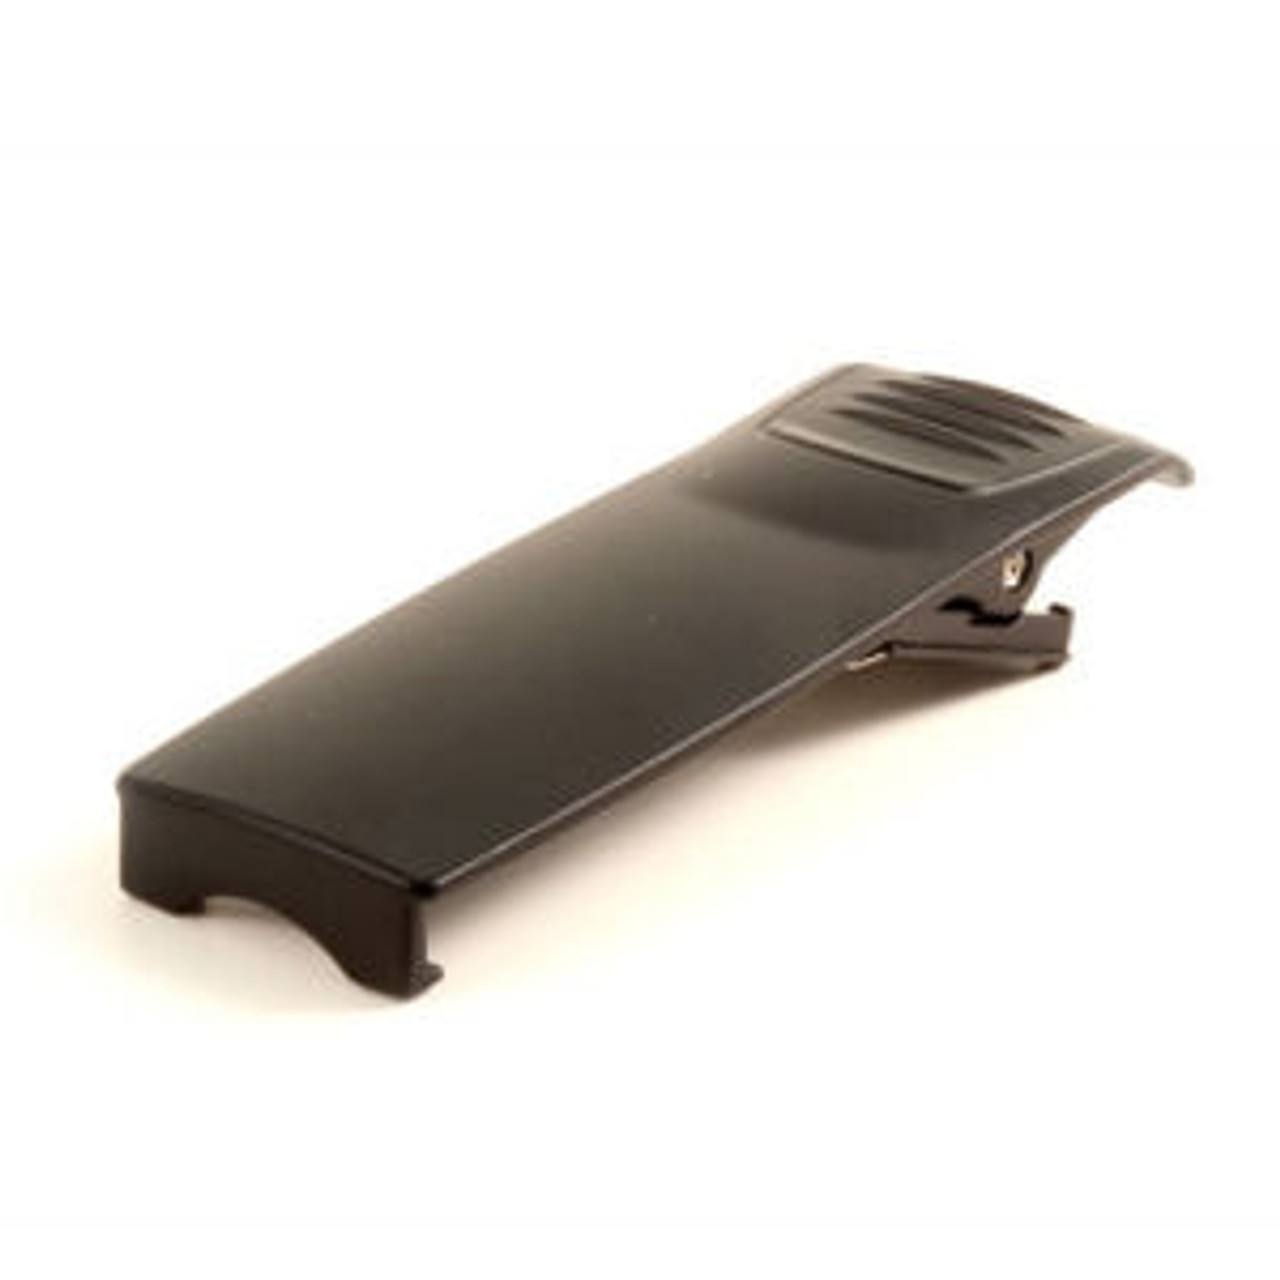 M/A-Com P5470 Metal, Spring Loaded Belt Clip